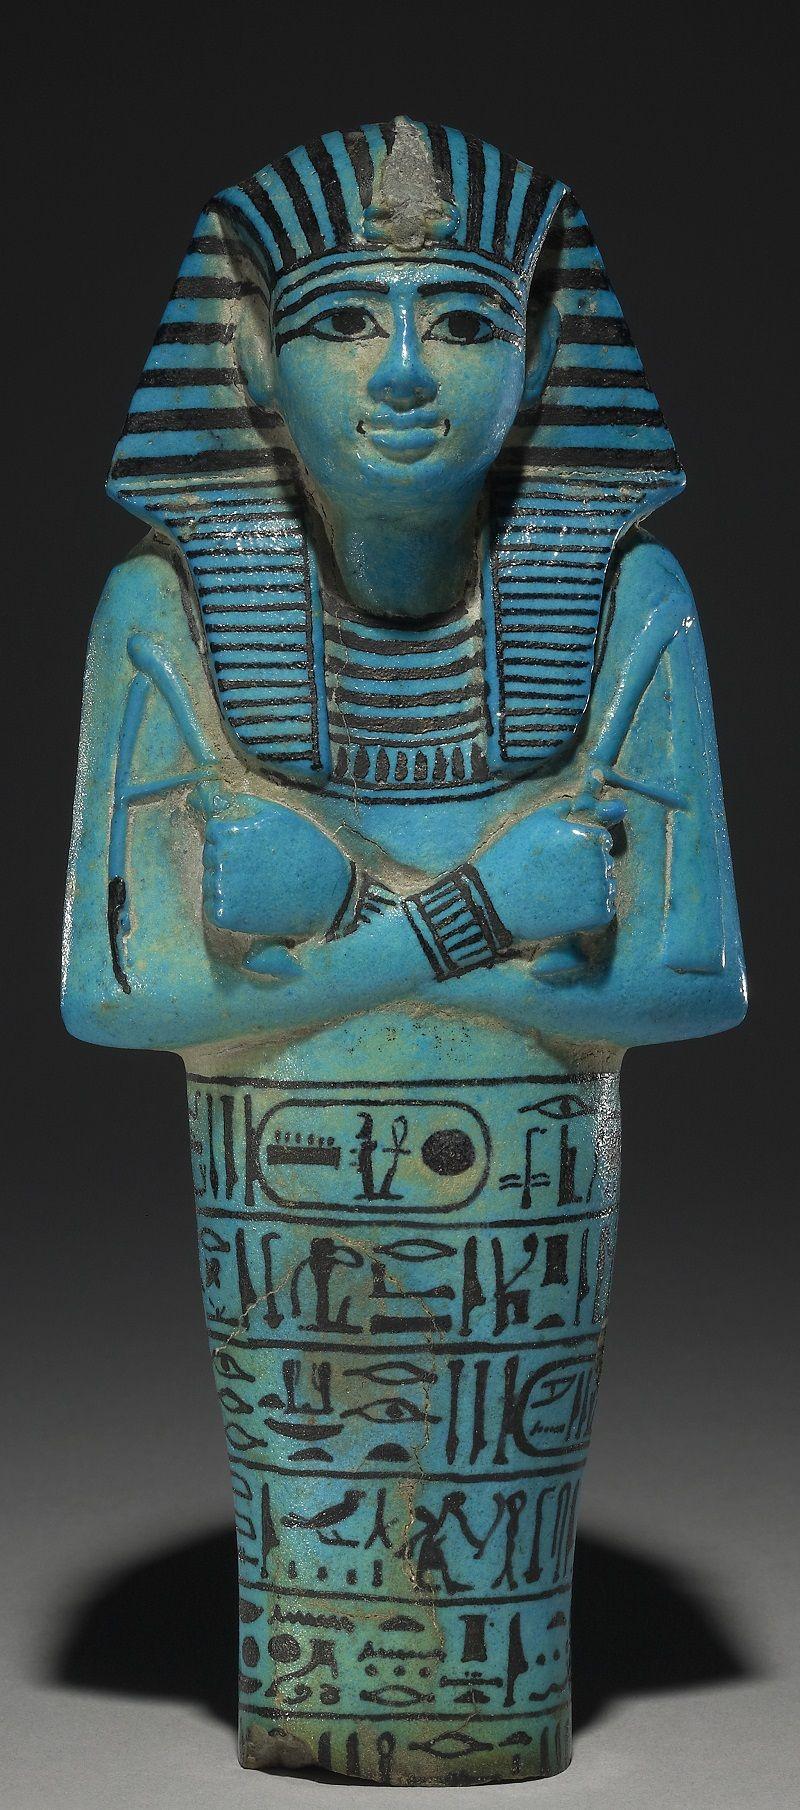 Estela de caliza con un faraón golpeando a un enemigo_81550a 1295 a C.) encontrada en Menfis. // Trustees of the British Museum